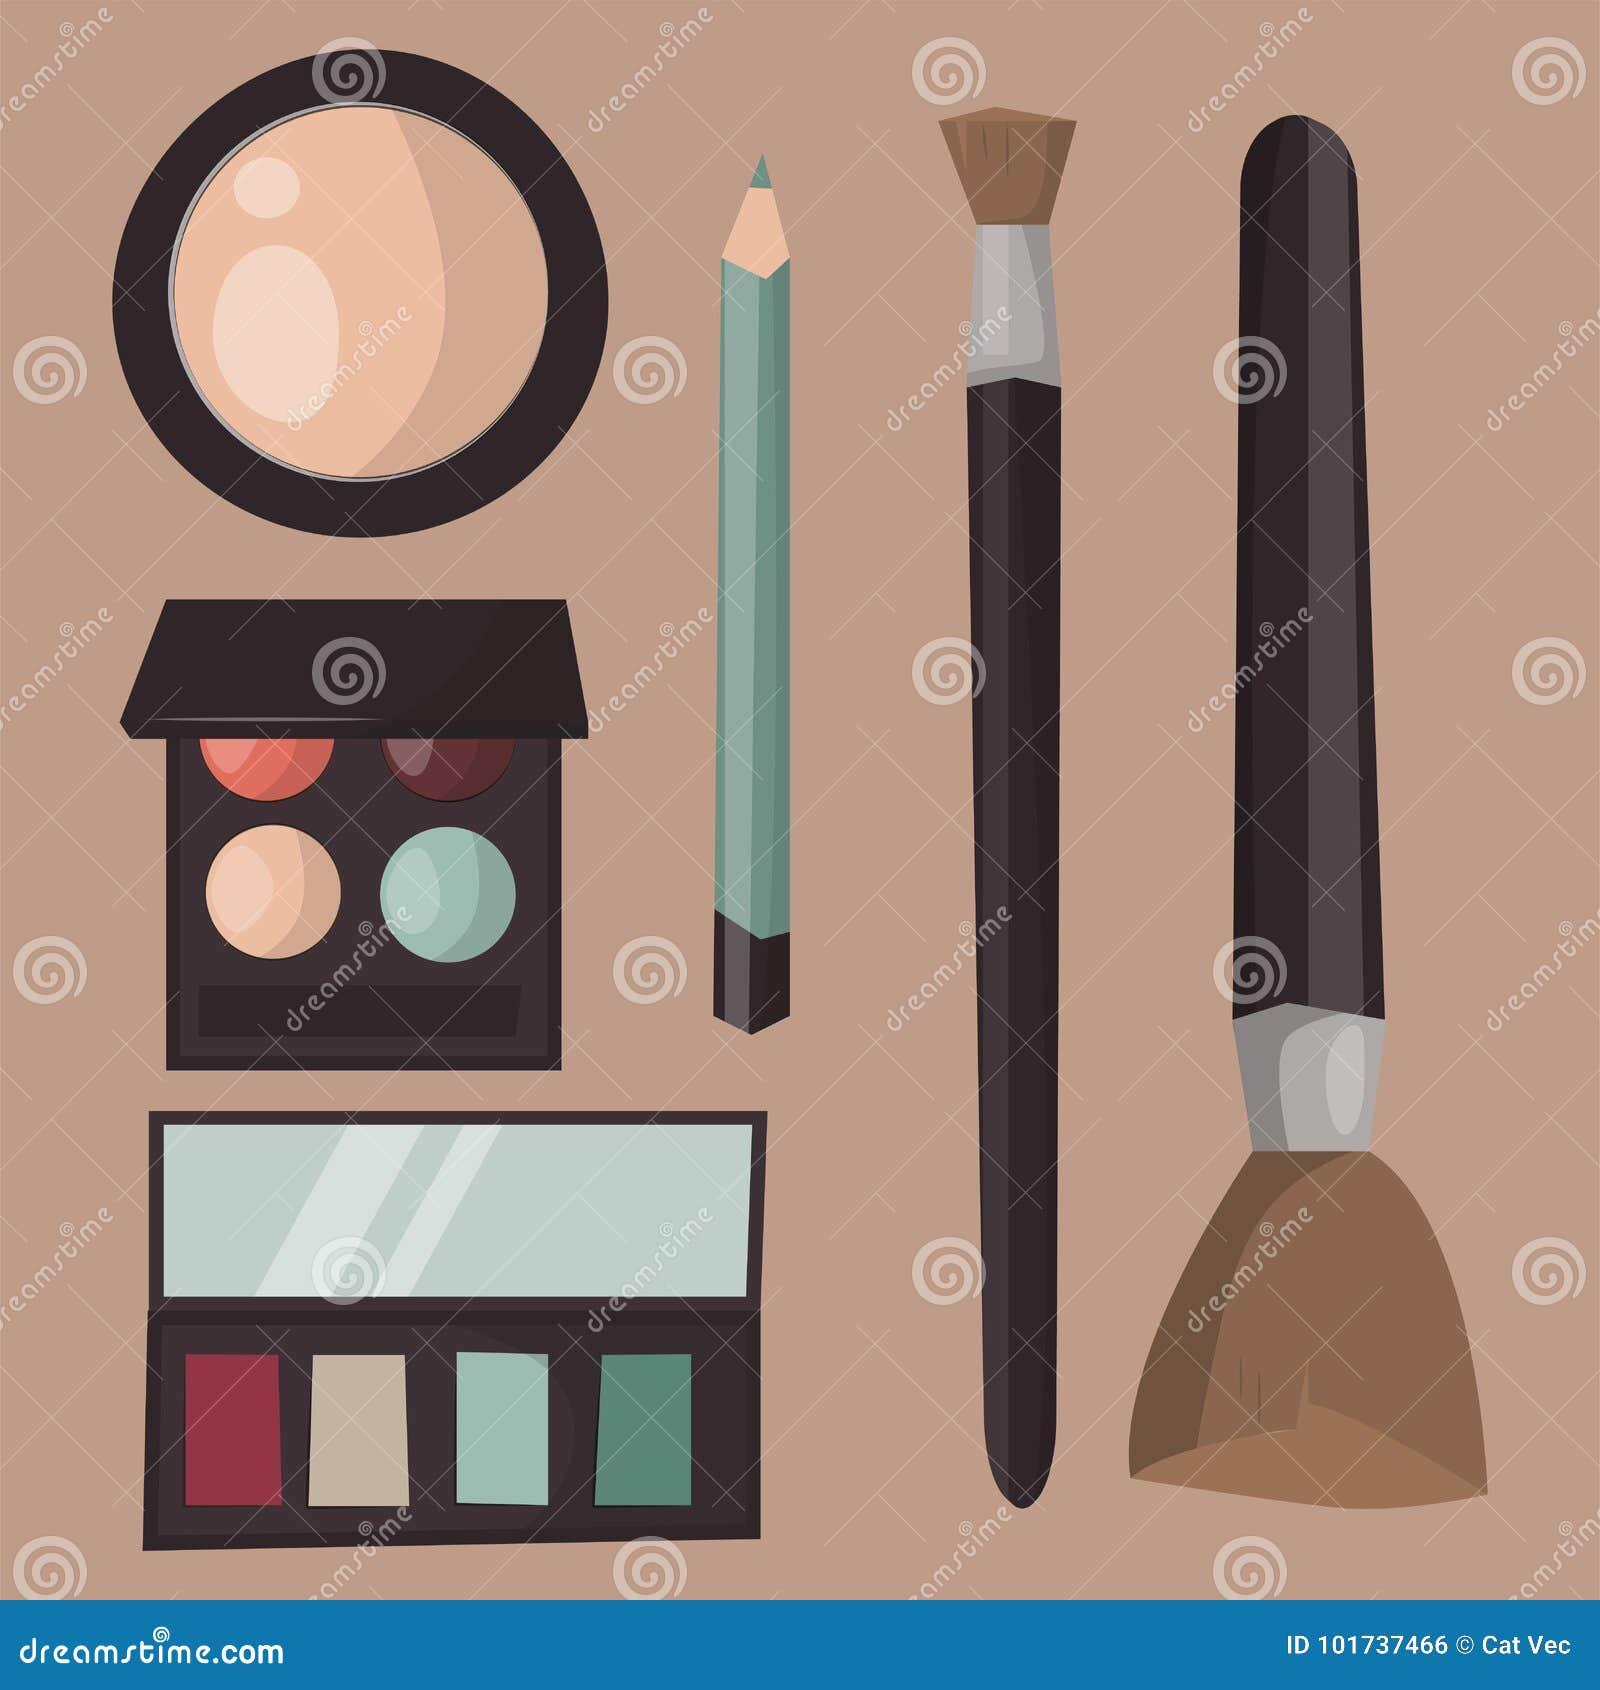 Mascara αρώματος εικονιδίων Makeup η χτένα βουρτσών προσοχής αντιμετώπισε το θηλυκό βοηθητικό διάνυσμα γοητείας σκιάς ματιών